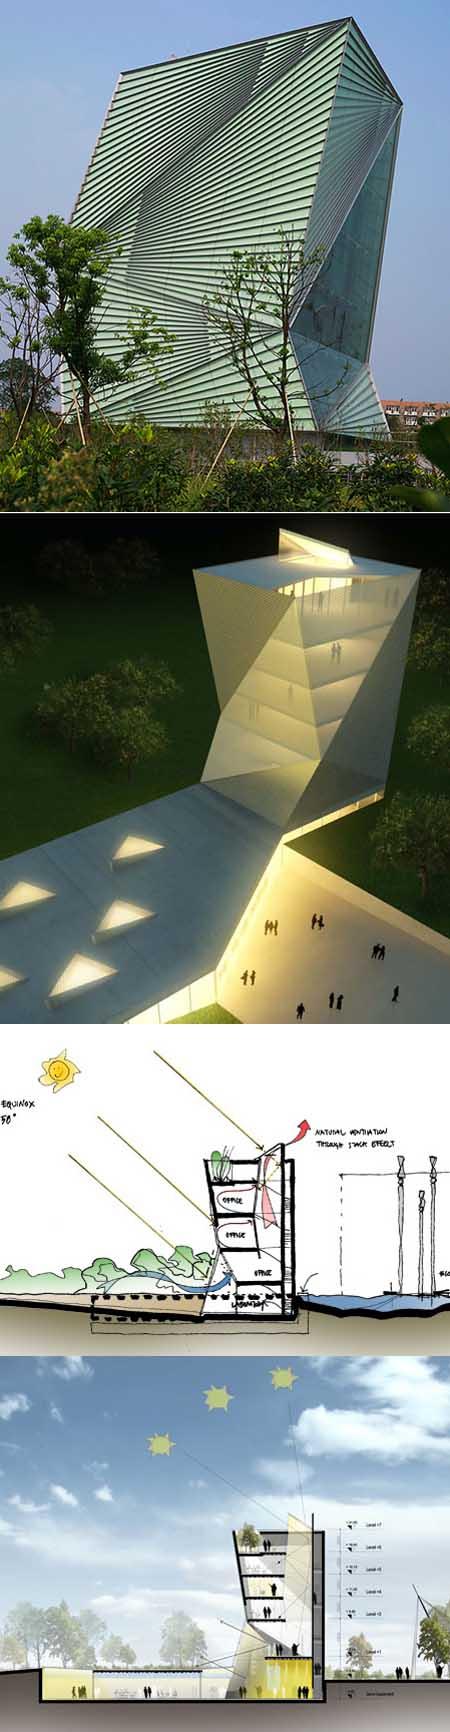 Mario Cucinella Architetture